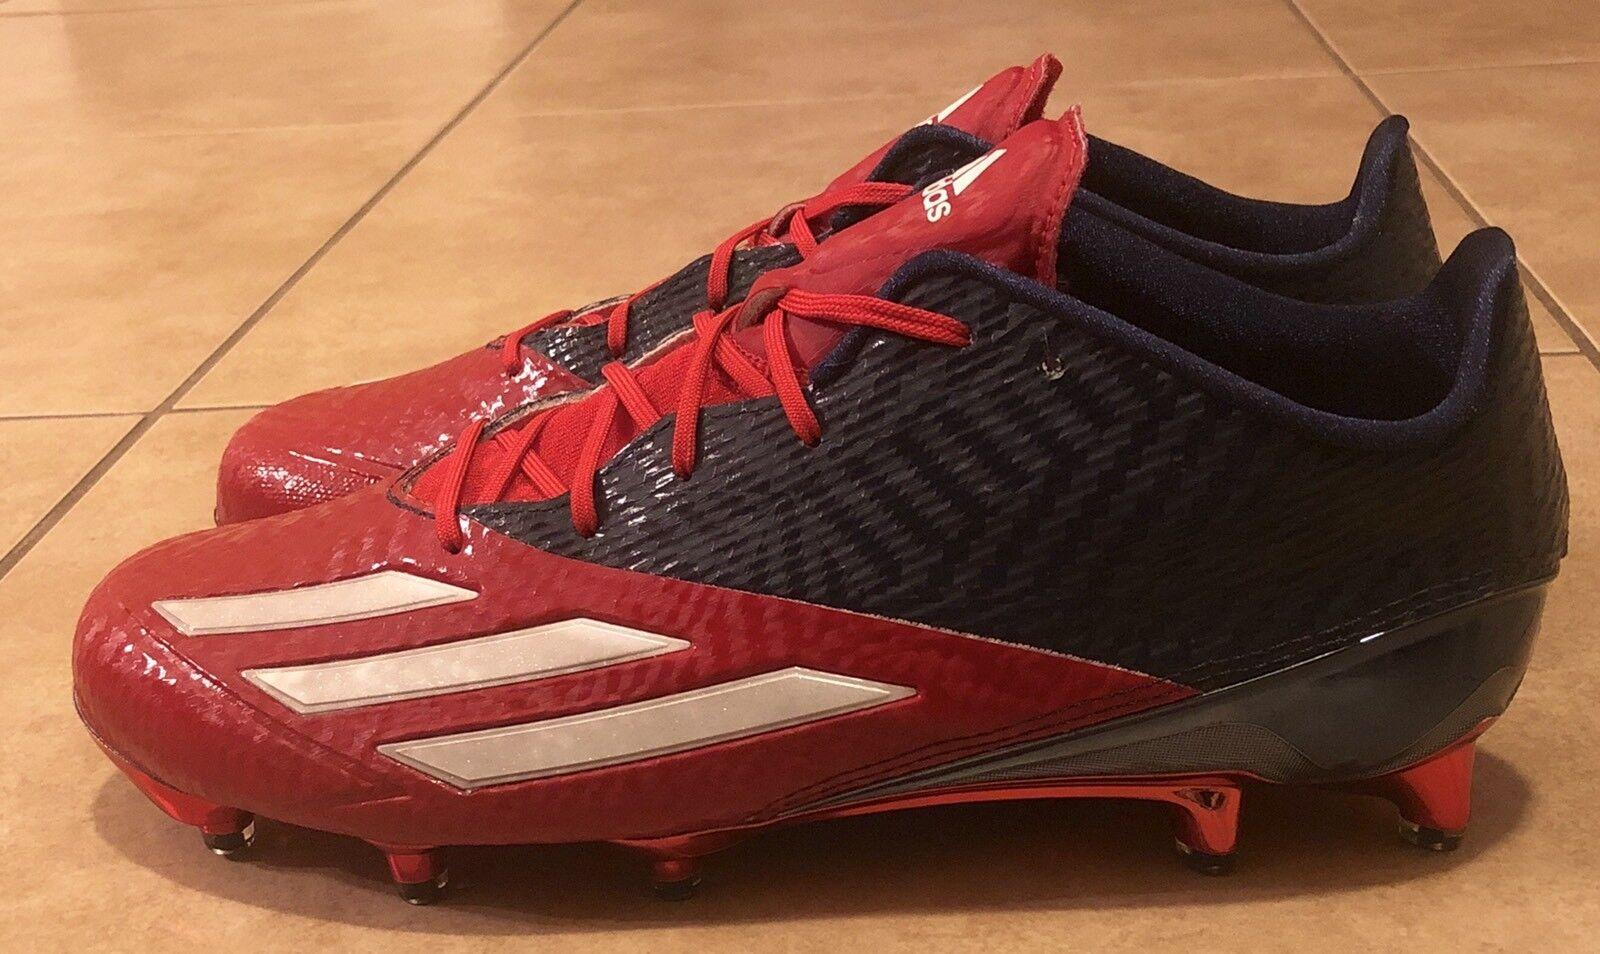 174e546c30d adidas Adizero 5 Star 5.0 Low Football Cleats Blue Red Men s Size 11 ...